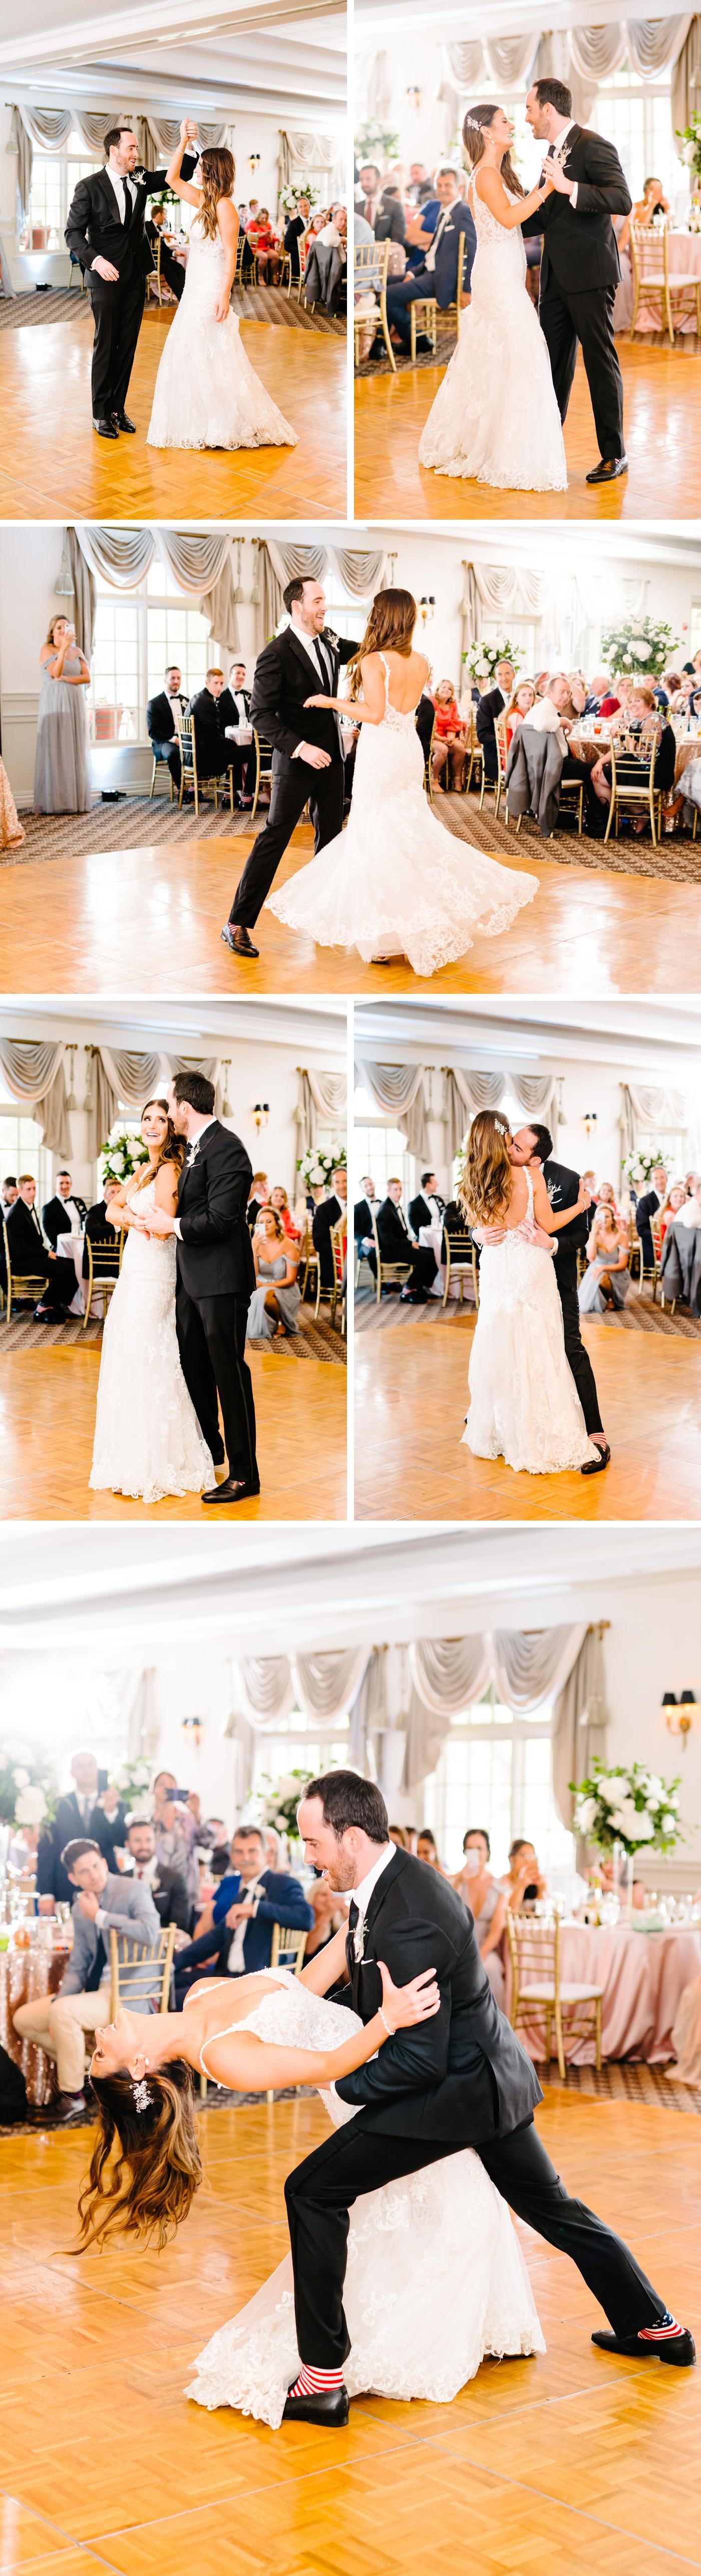 chicago-fine-art-wedding-photography-duncan77